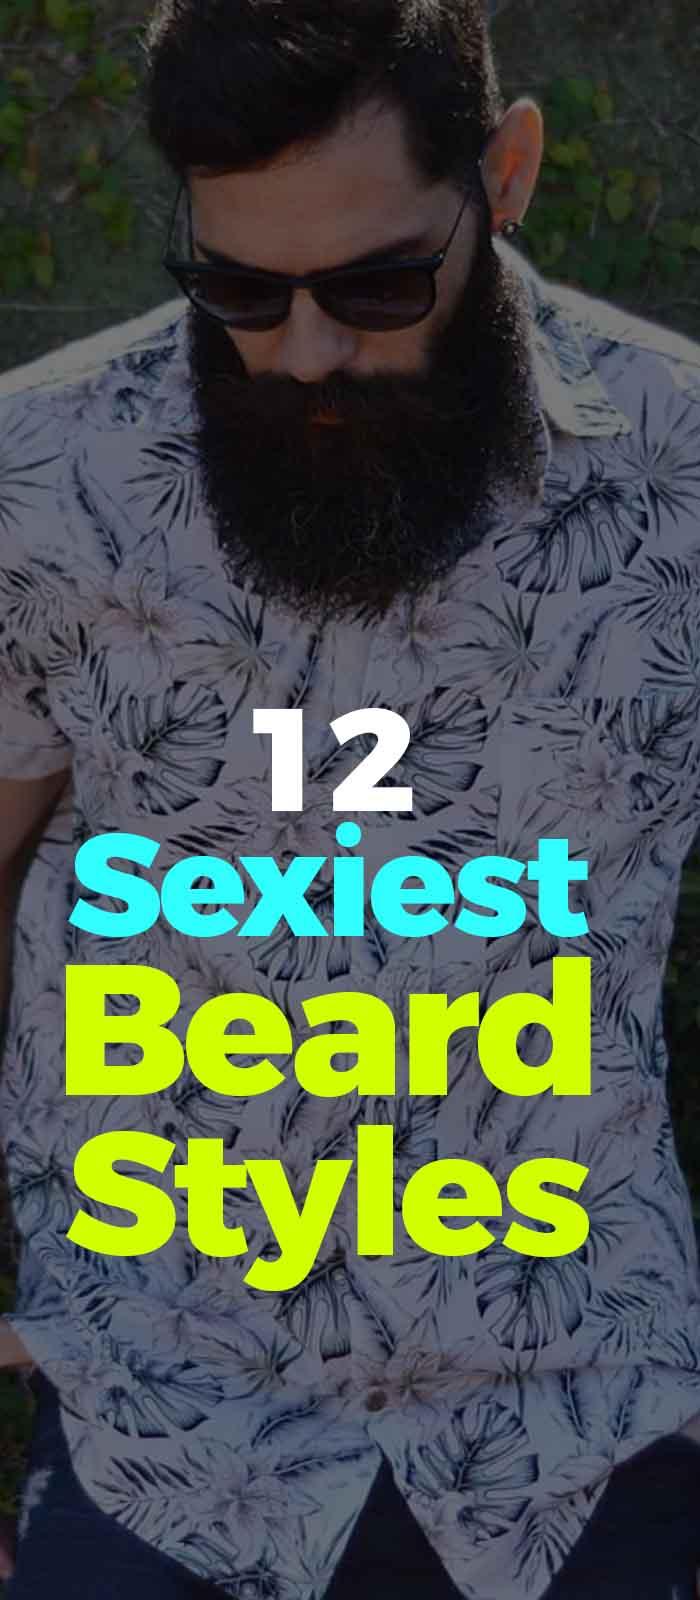 White Printed shirt,Long Beard, Sunglasses look for men!